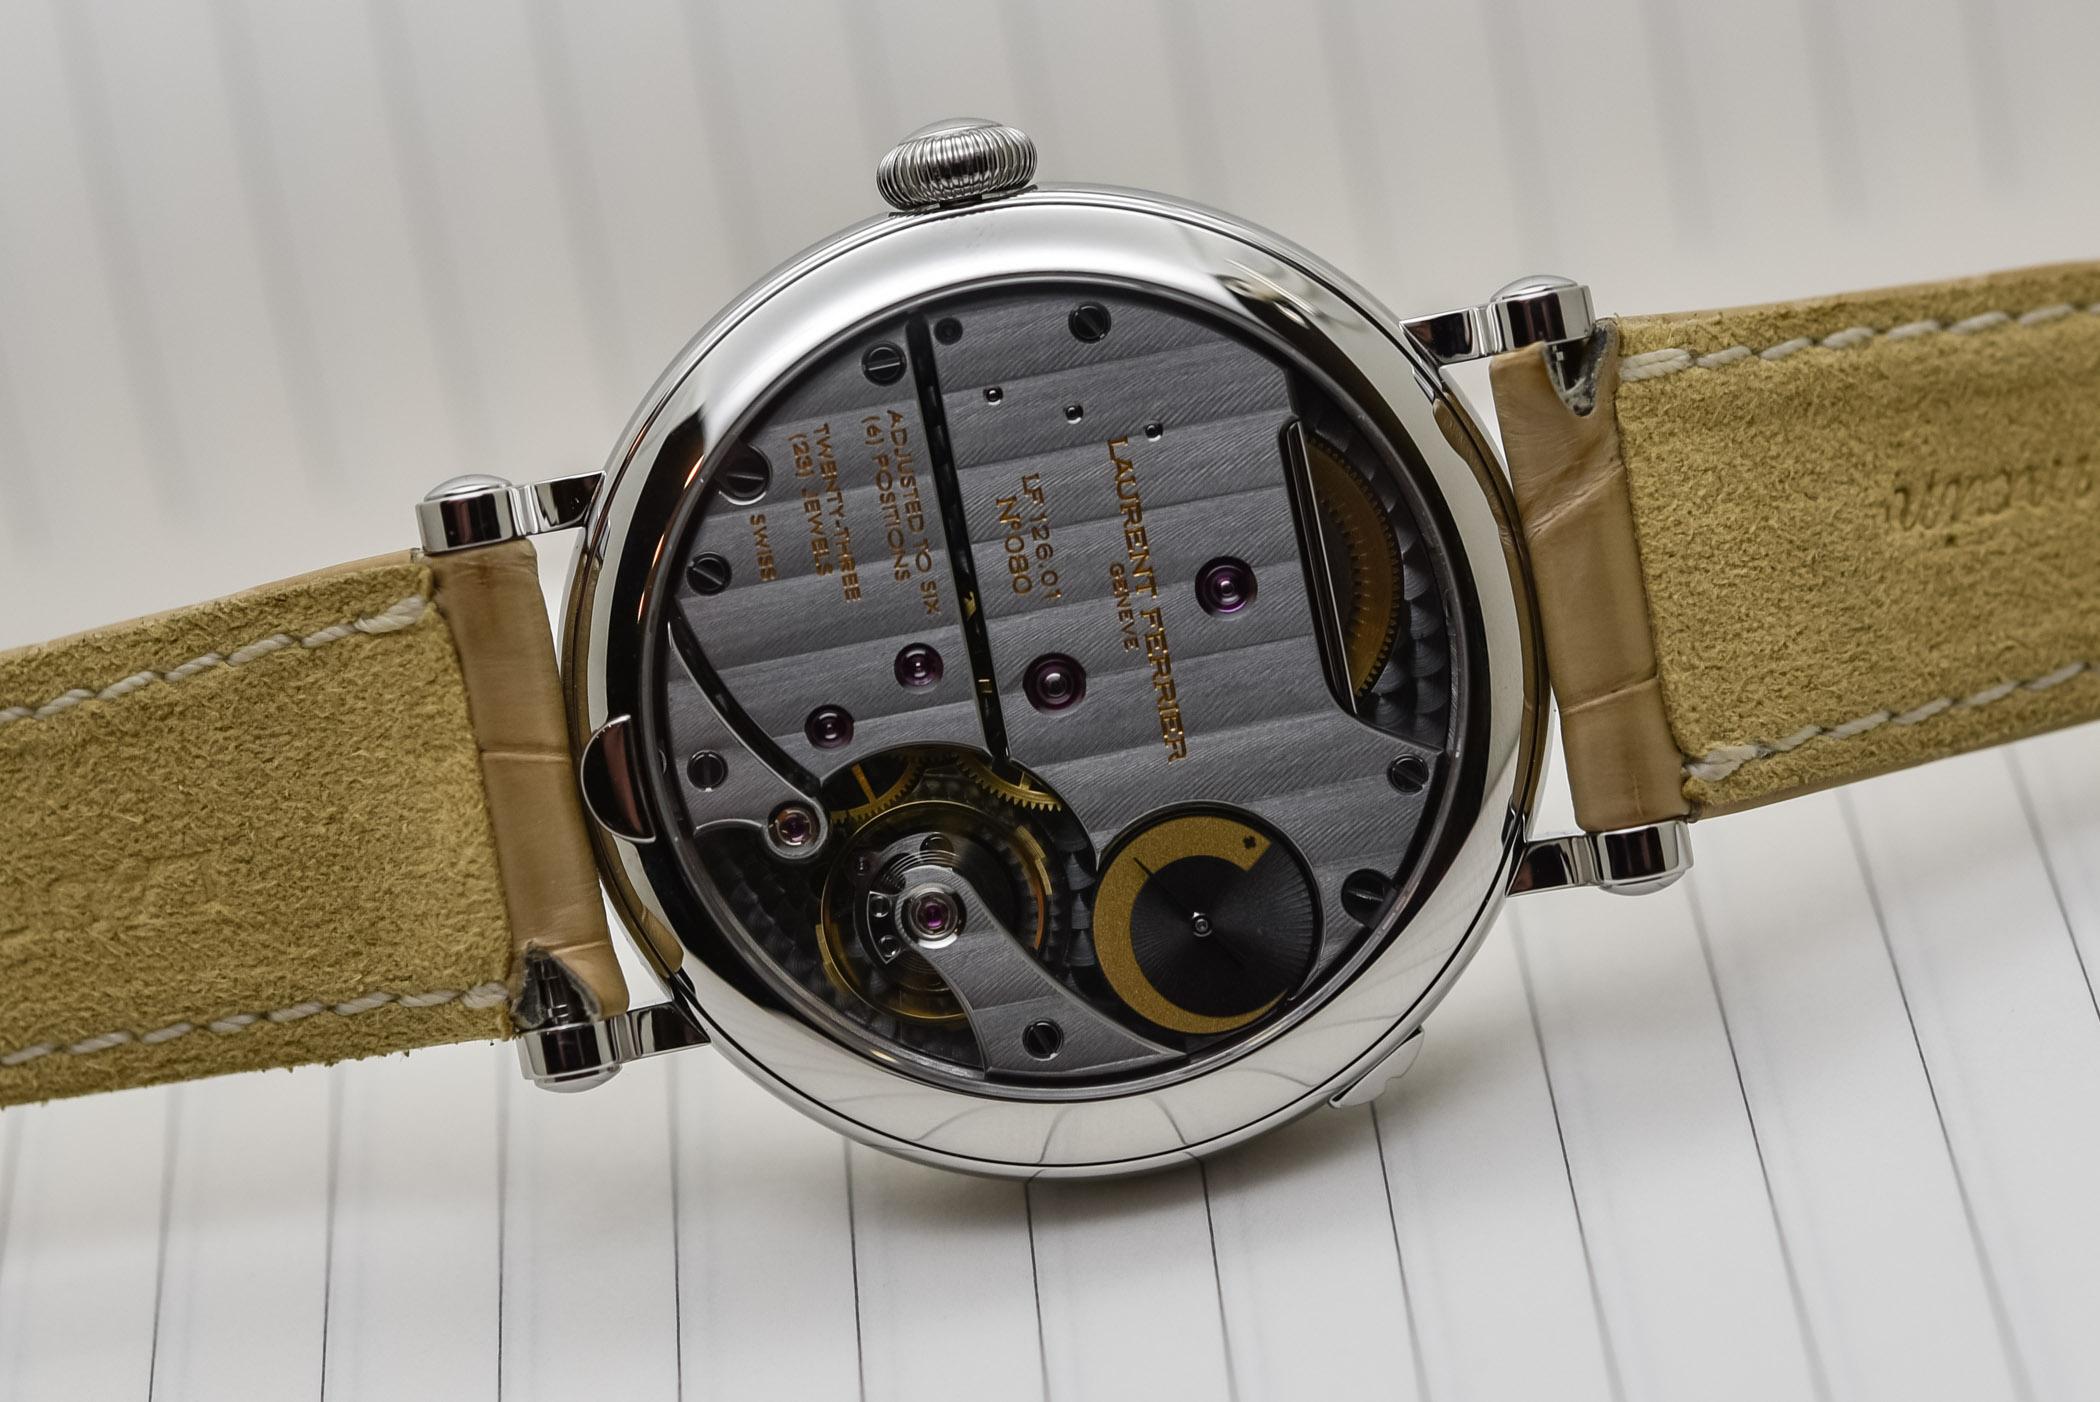 https://k8q7r7a2.stackpathcdn.com/wp-content/uploads/2020/02/Laurent-Ferrier-Galet-Annual-Calendar-Vintage-Opaline-Yellow-Gold-Dial-2.jpg